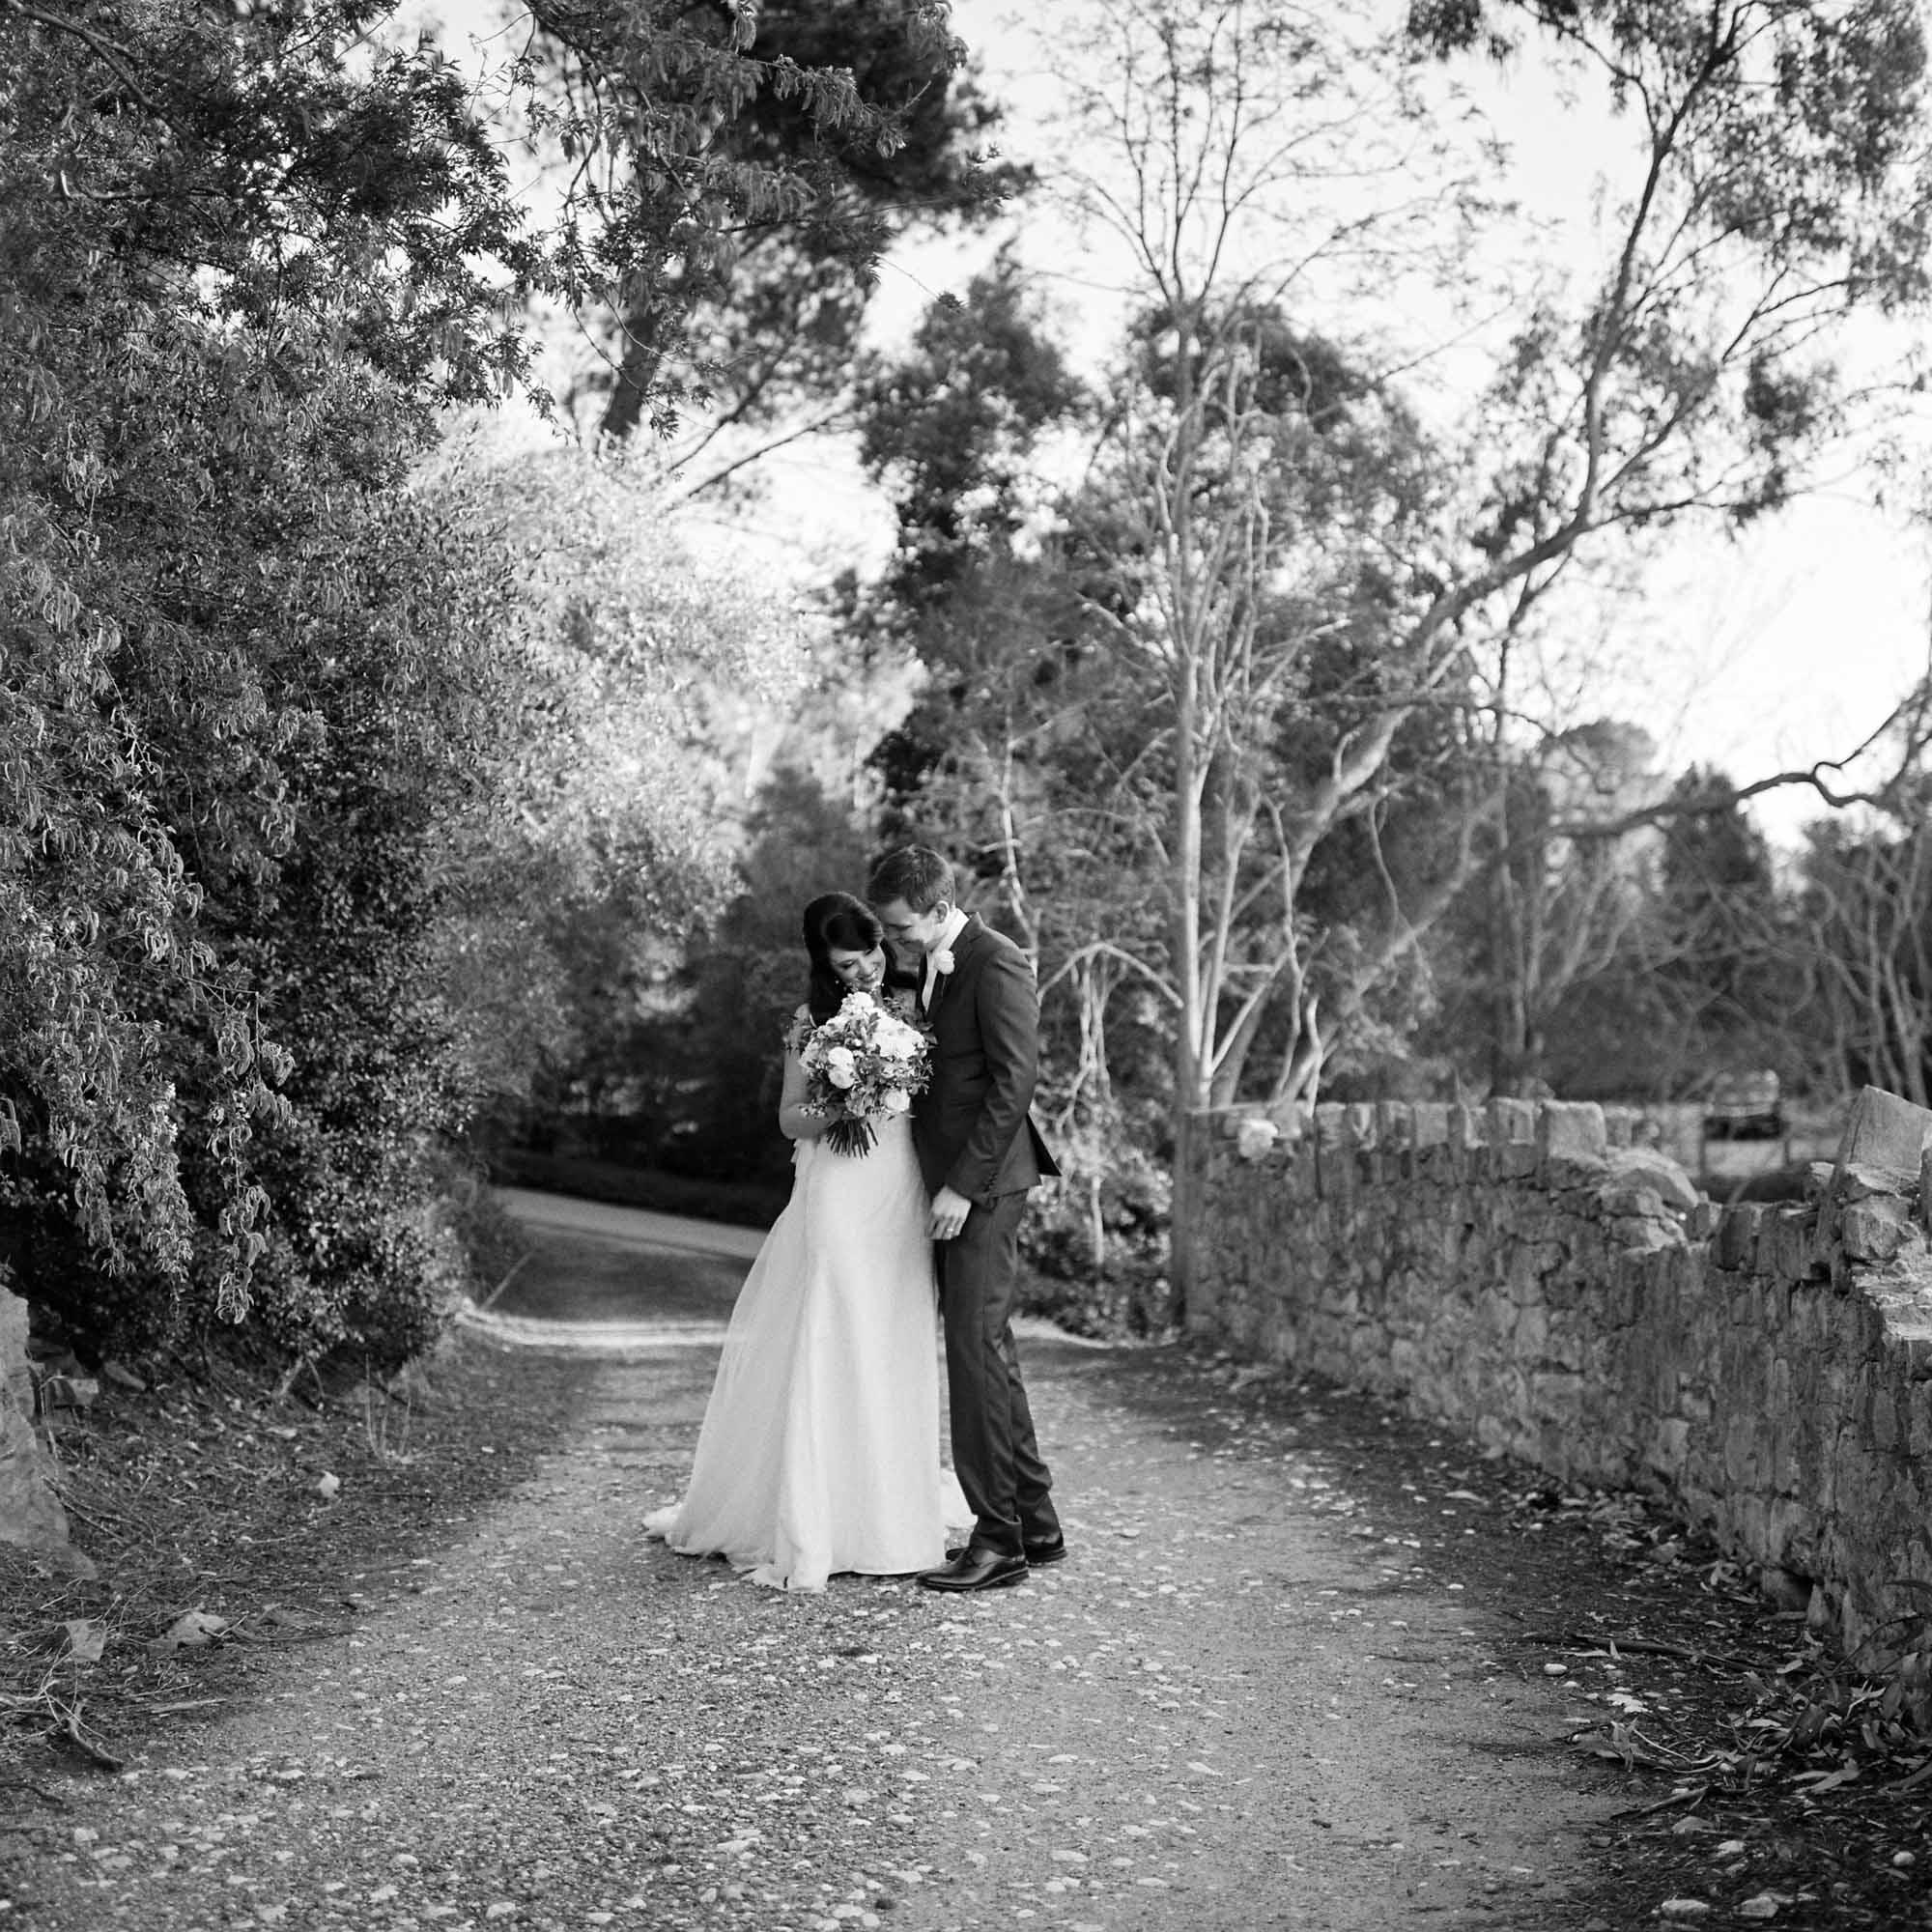 Glen-Ewin-Estate-wedding-photography-068.jpg